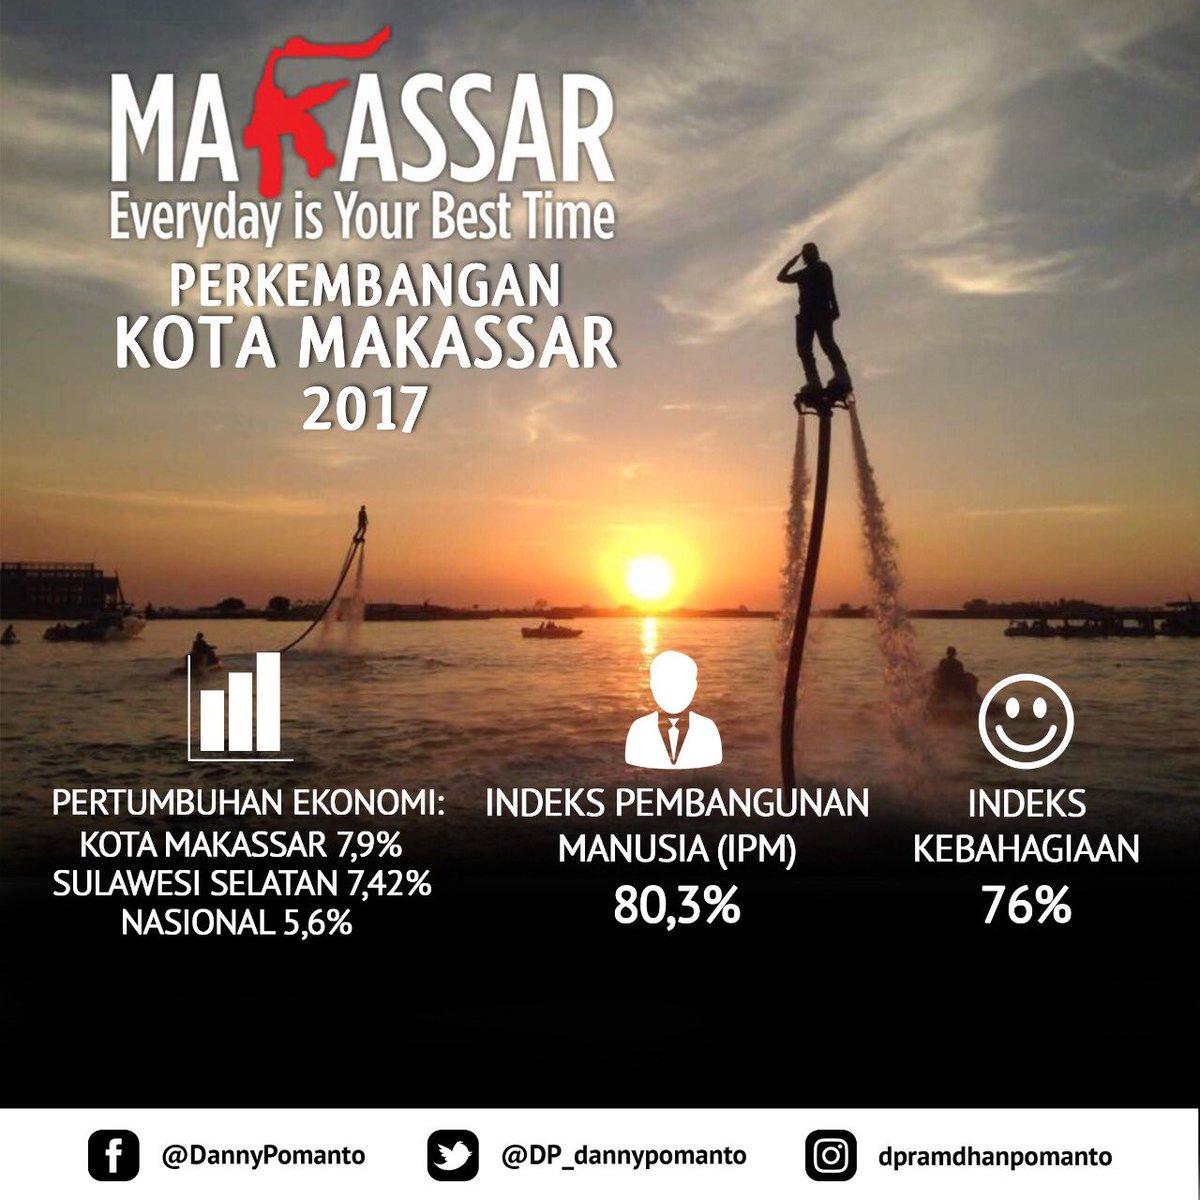 Perkembangan Kota Makassar 2017 @DP_dannypomanto https://t.co/iQh7num4dz